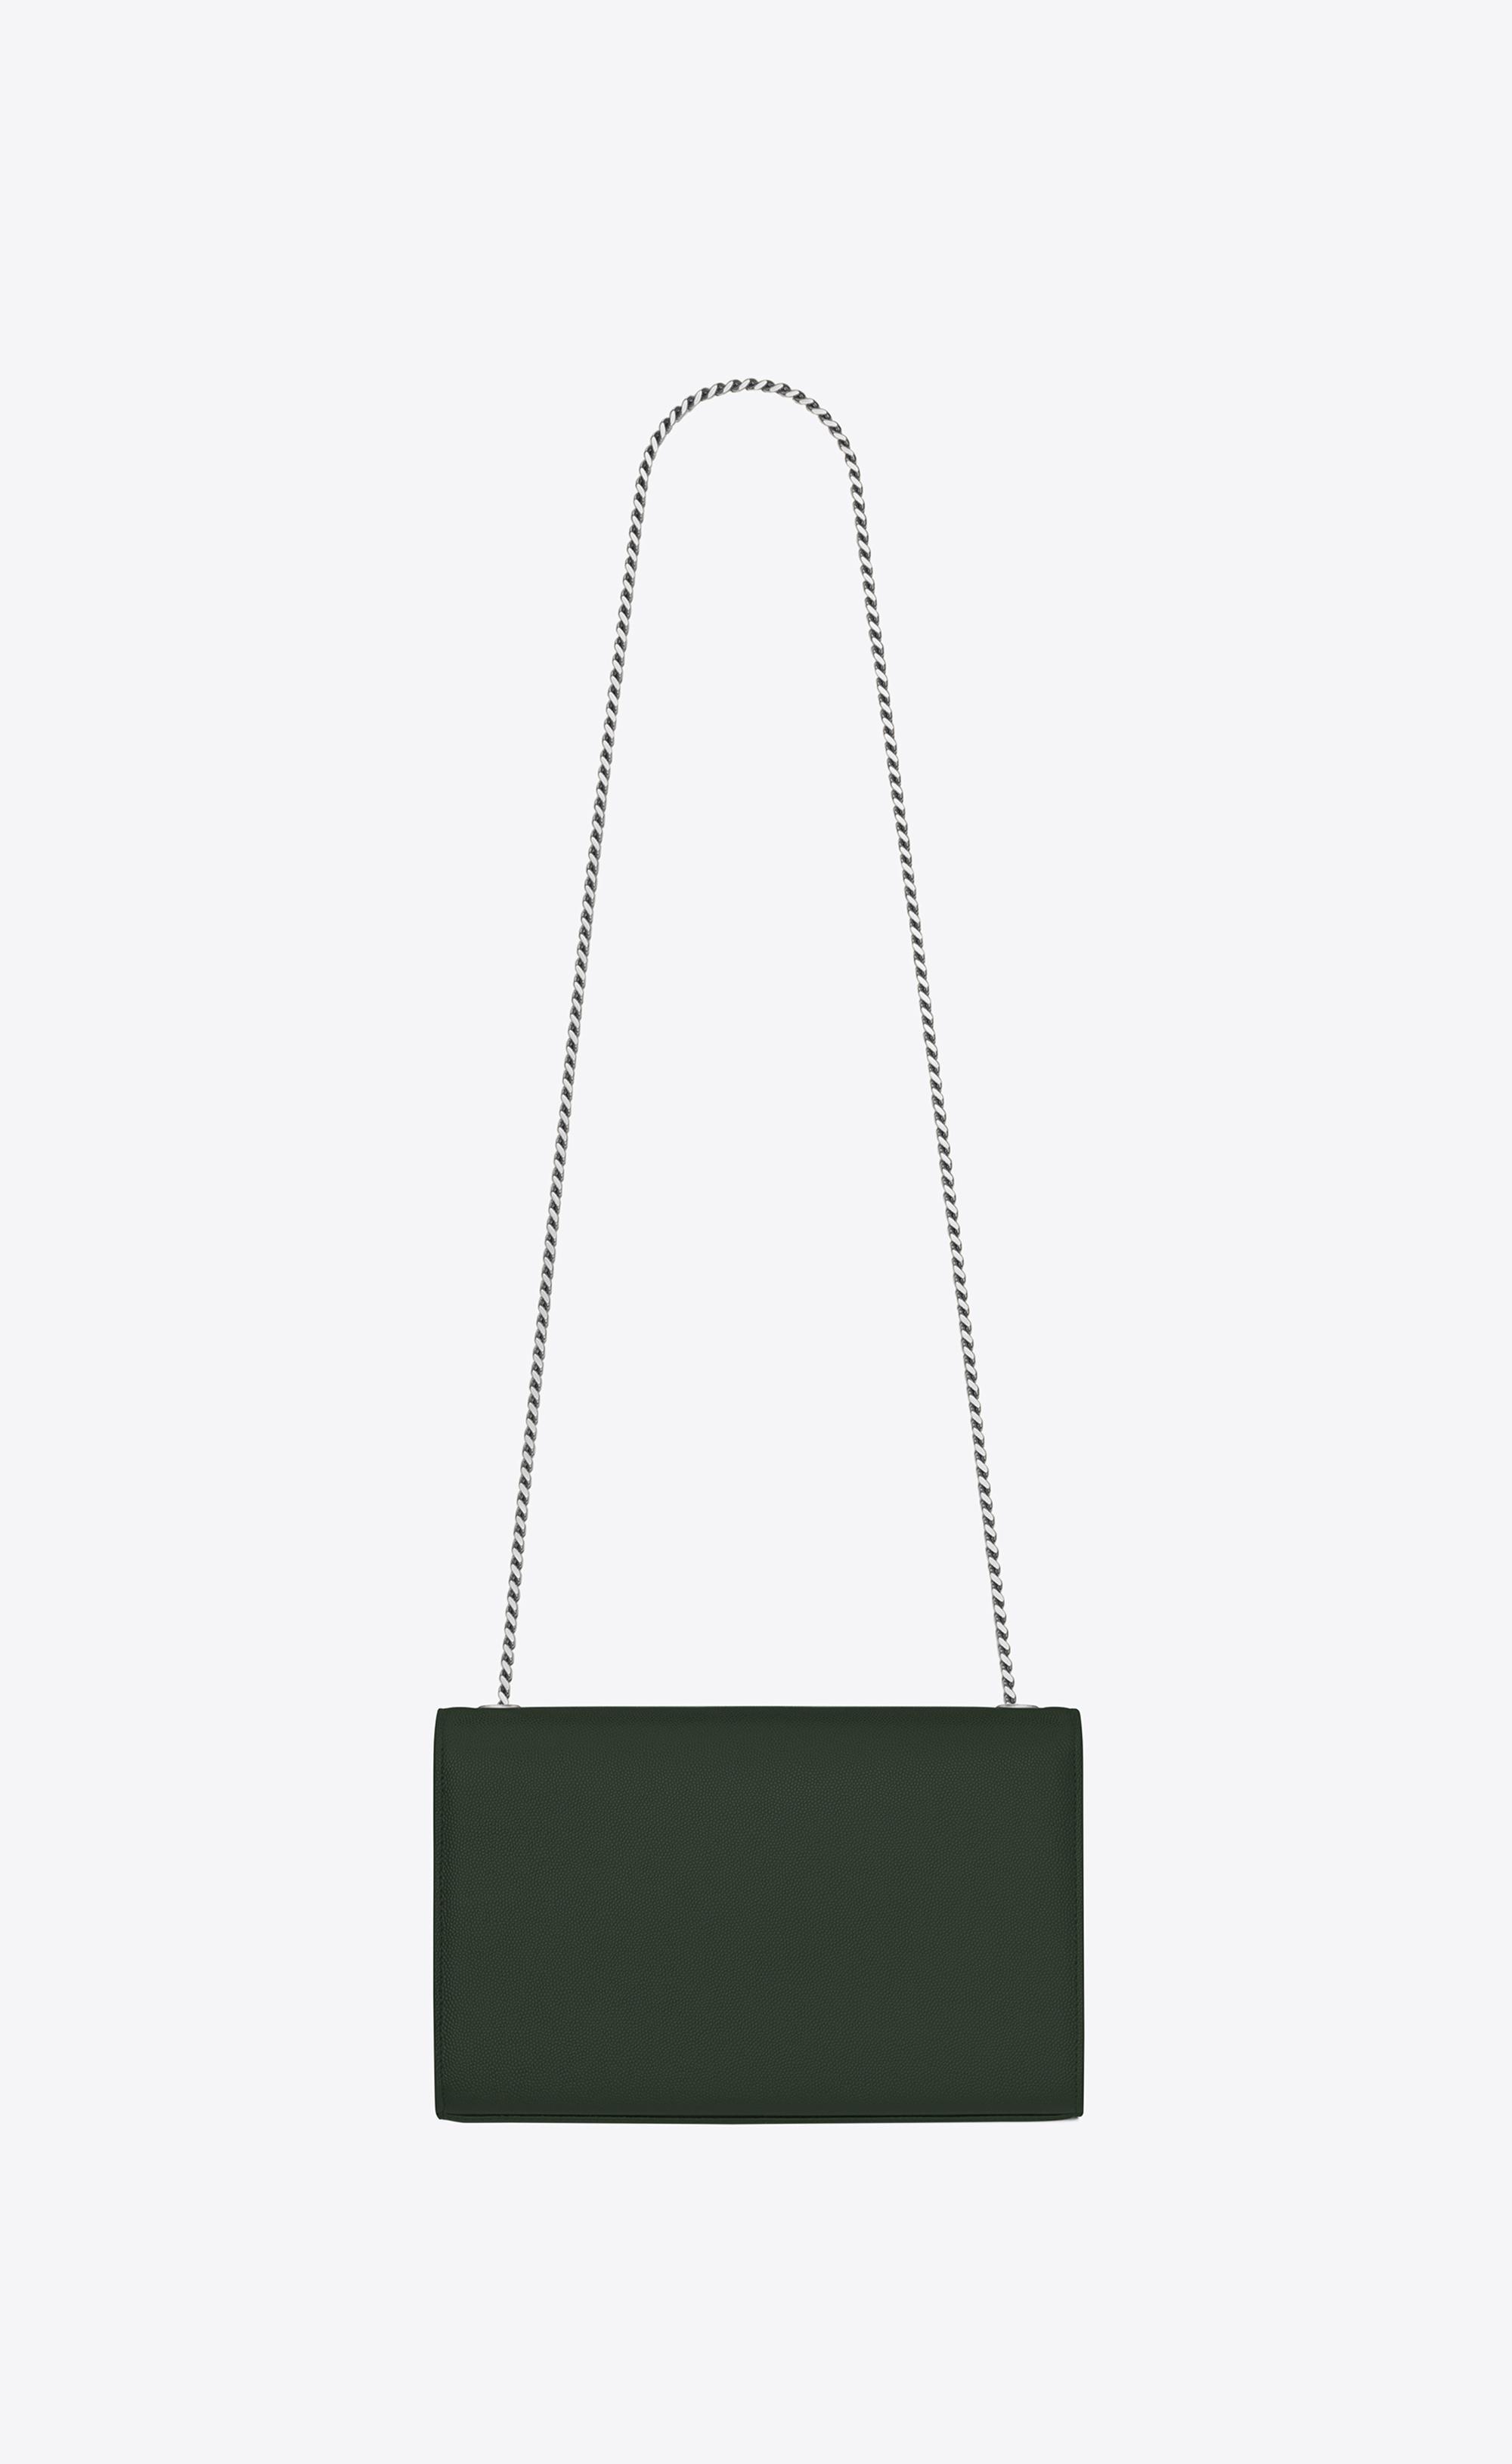 ea1acadd070 Saint Laurent Kate Medium In Grain De Poudre Embossed Leather in ...